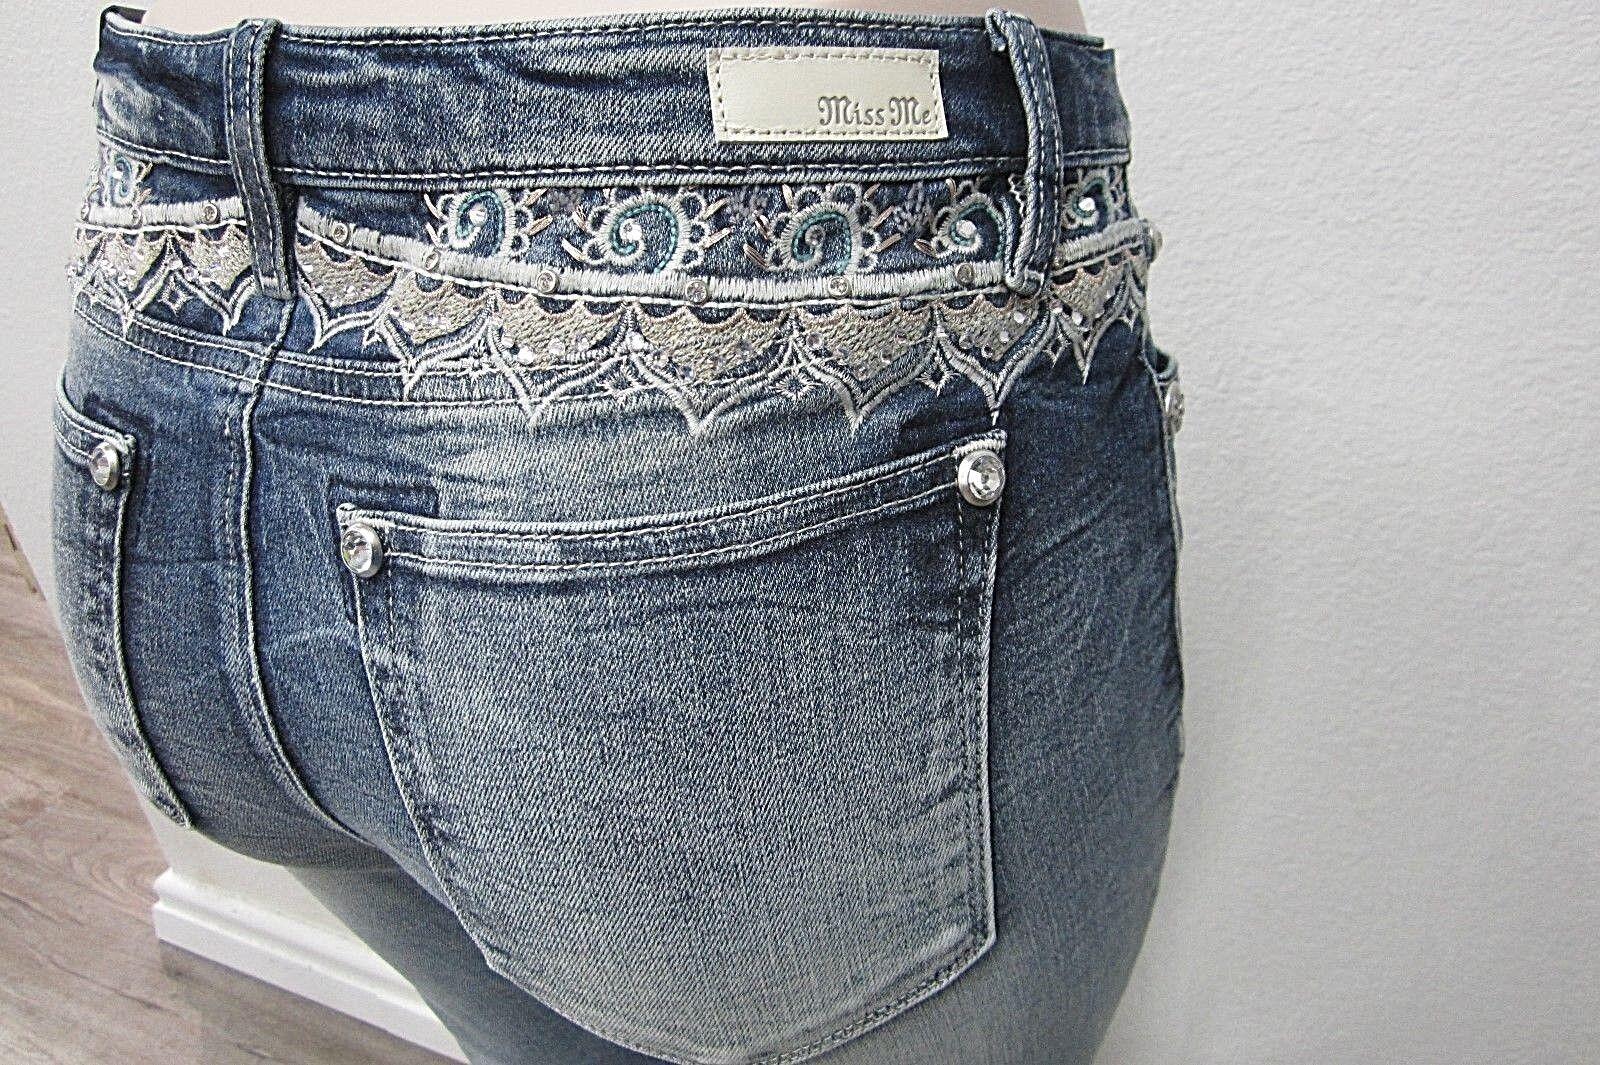 NWT Miss Me  Embellished Yoke Medium Wash Basic Skinny Cut Jeans M3150S Sz 25x29